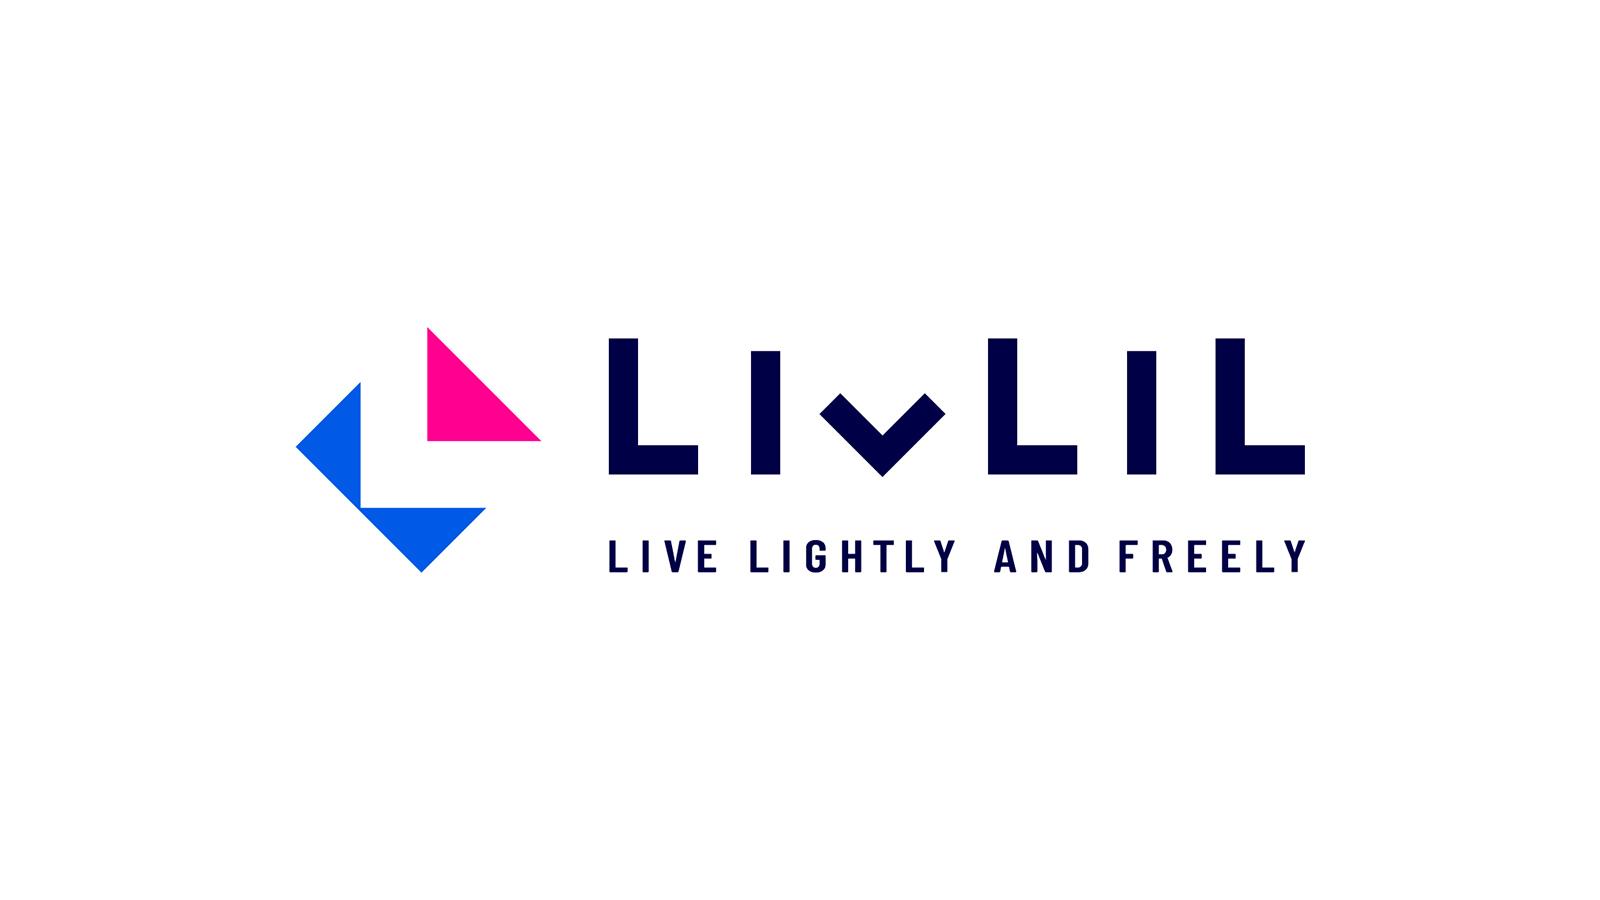 【PR】2021年2月、家具付き賃貸検索サイト「LIVLIL(リブリル)」をリリース/Weekly&Monthly株式会社